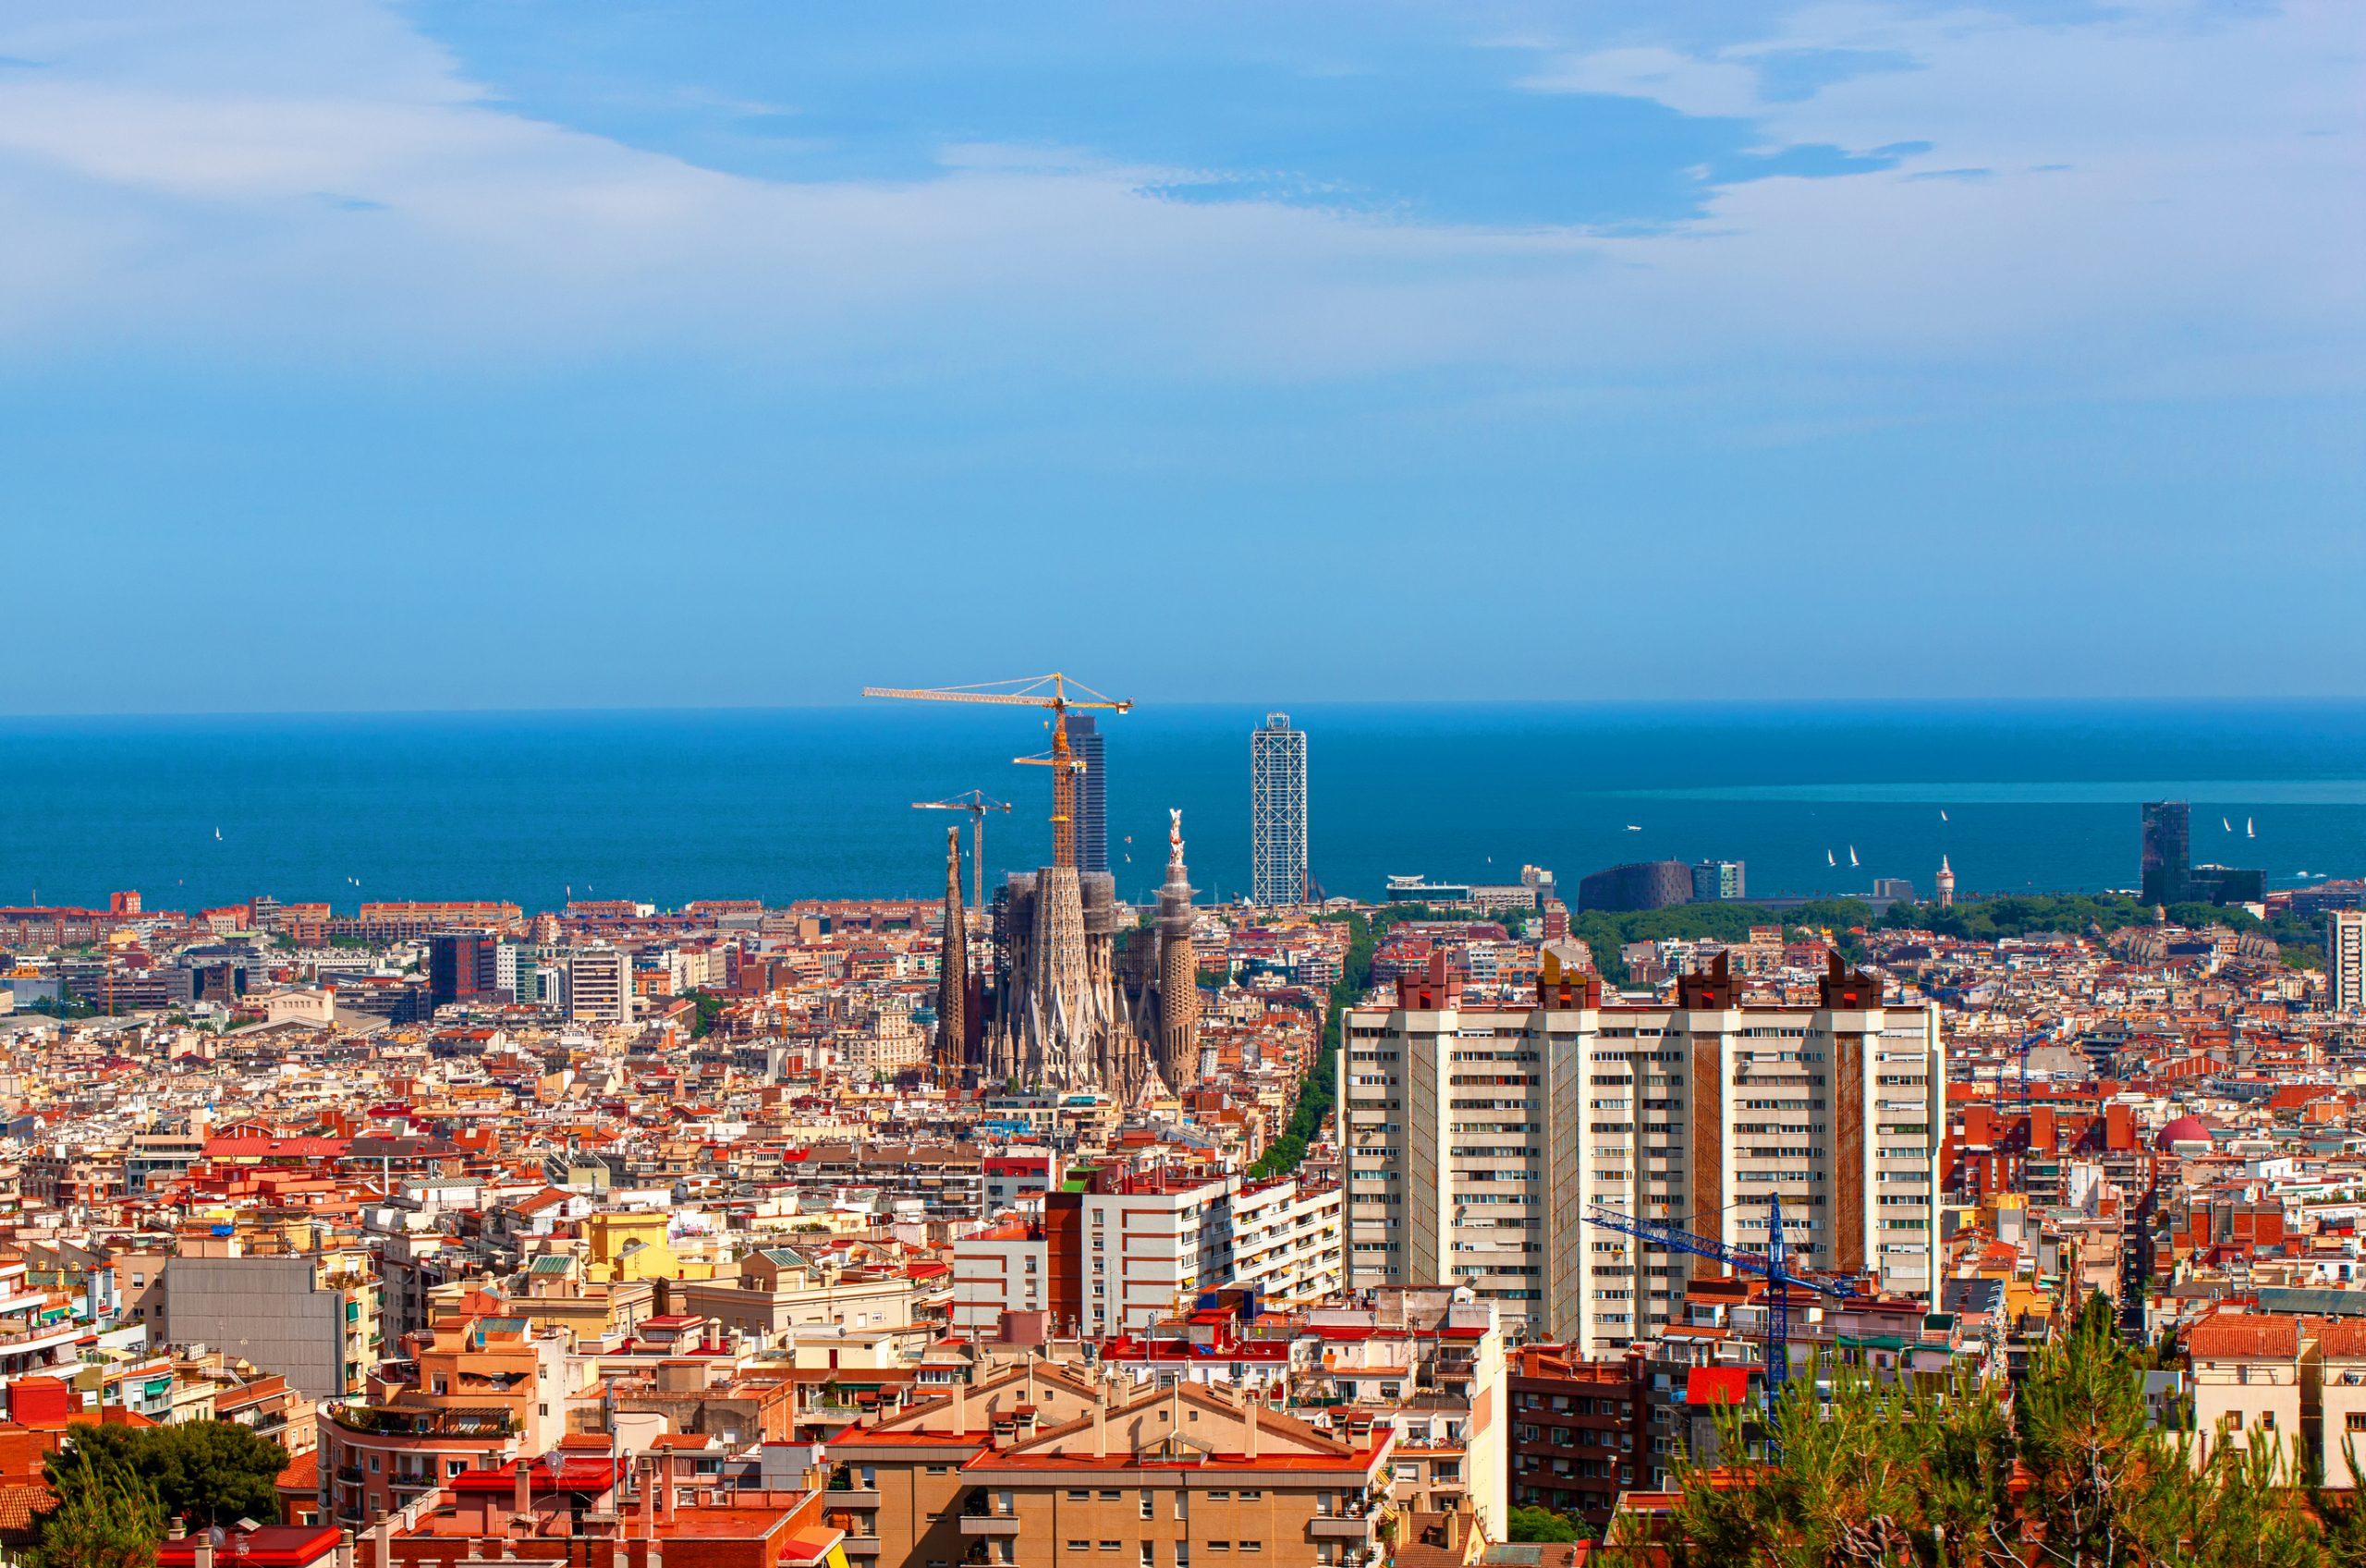 View of Barcelona city skyline